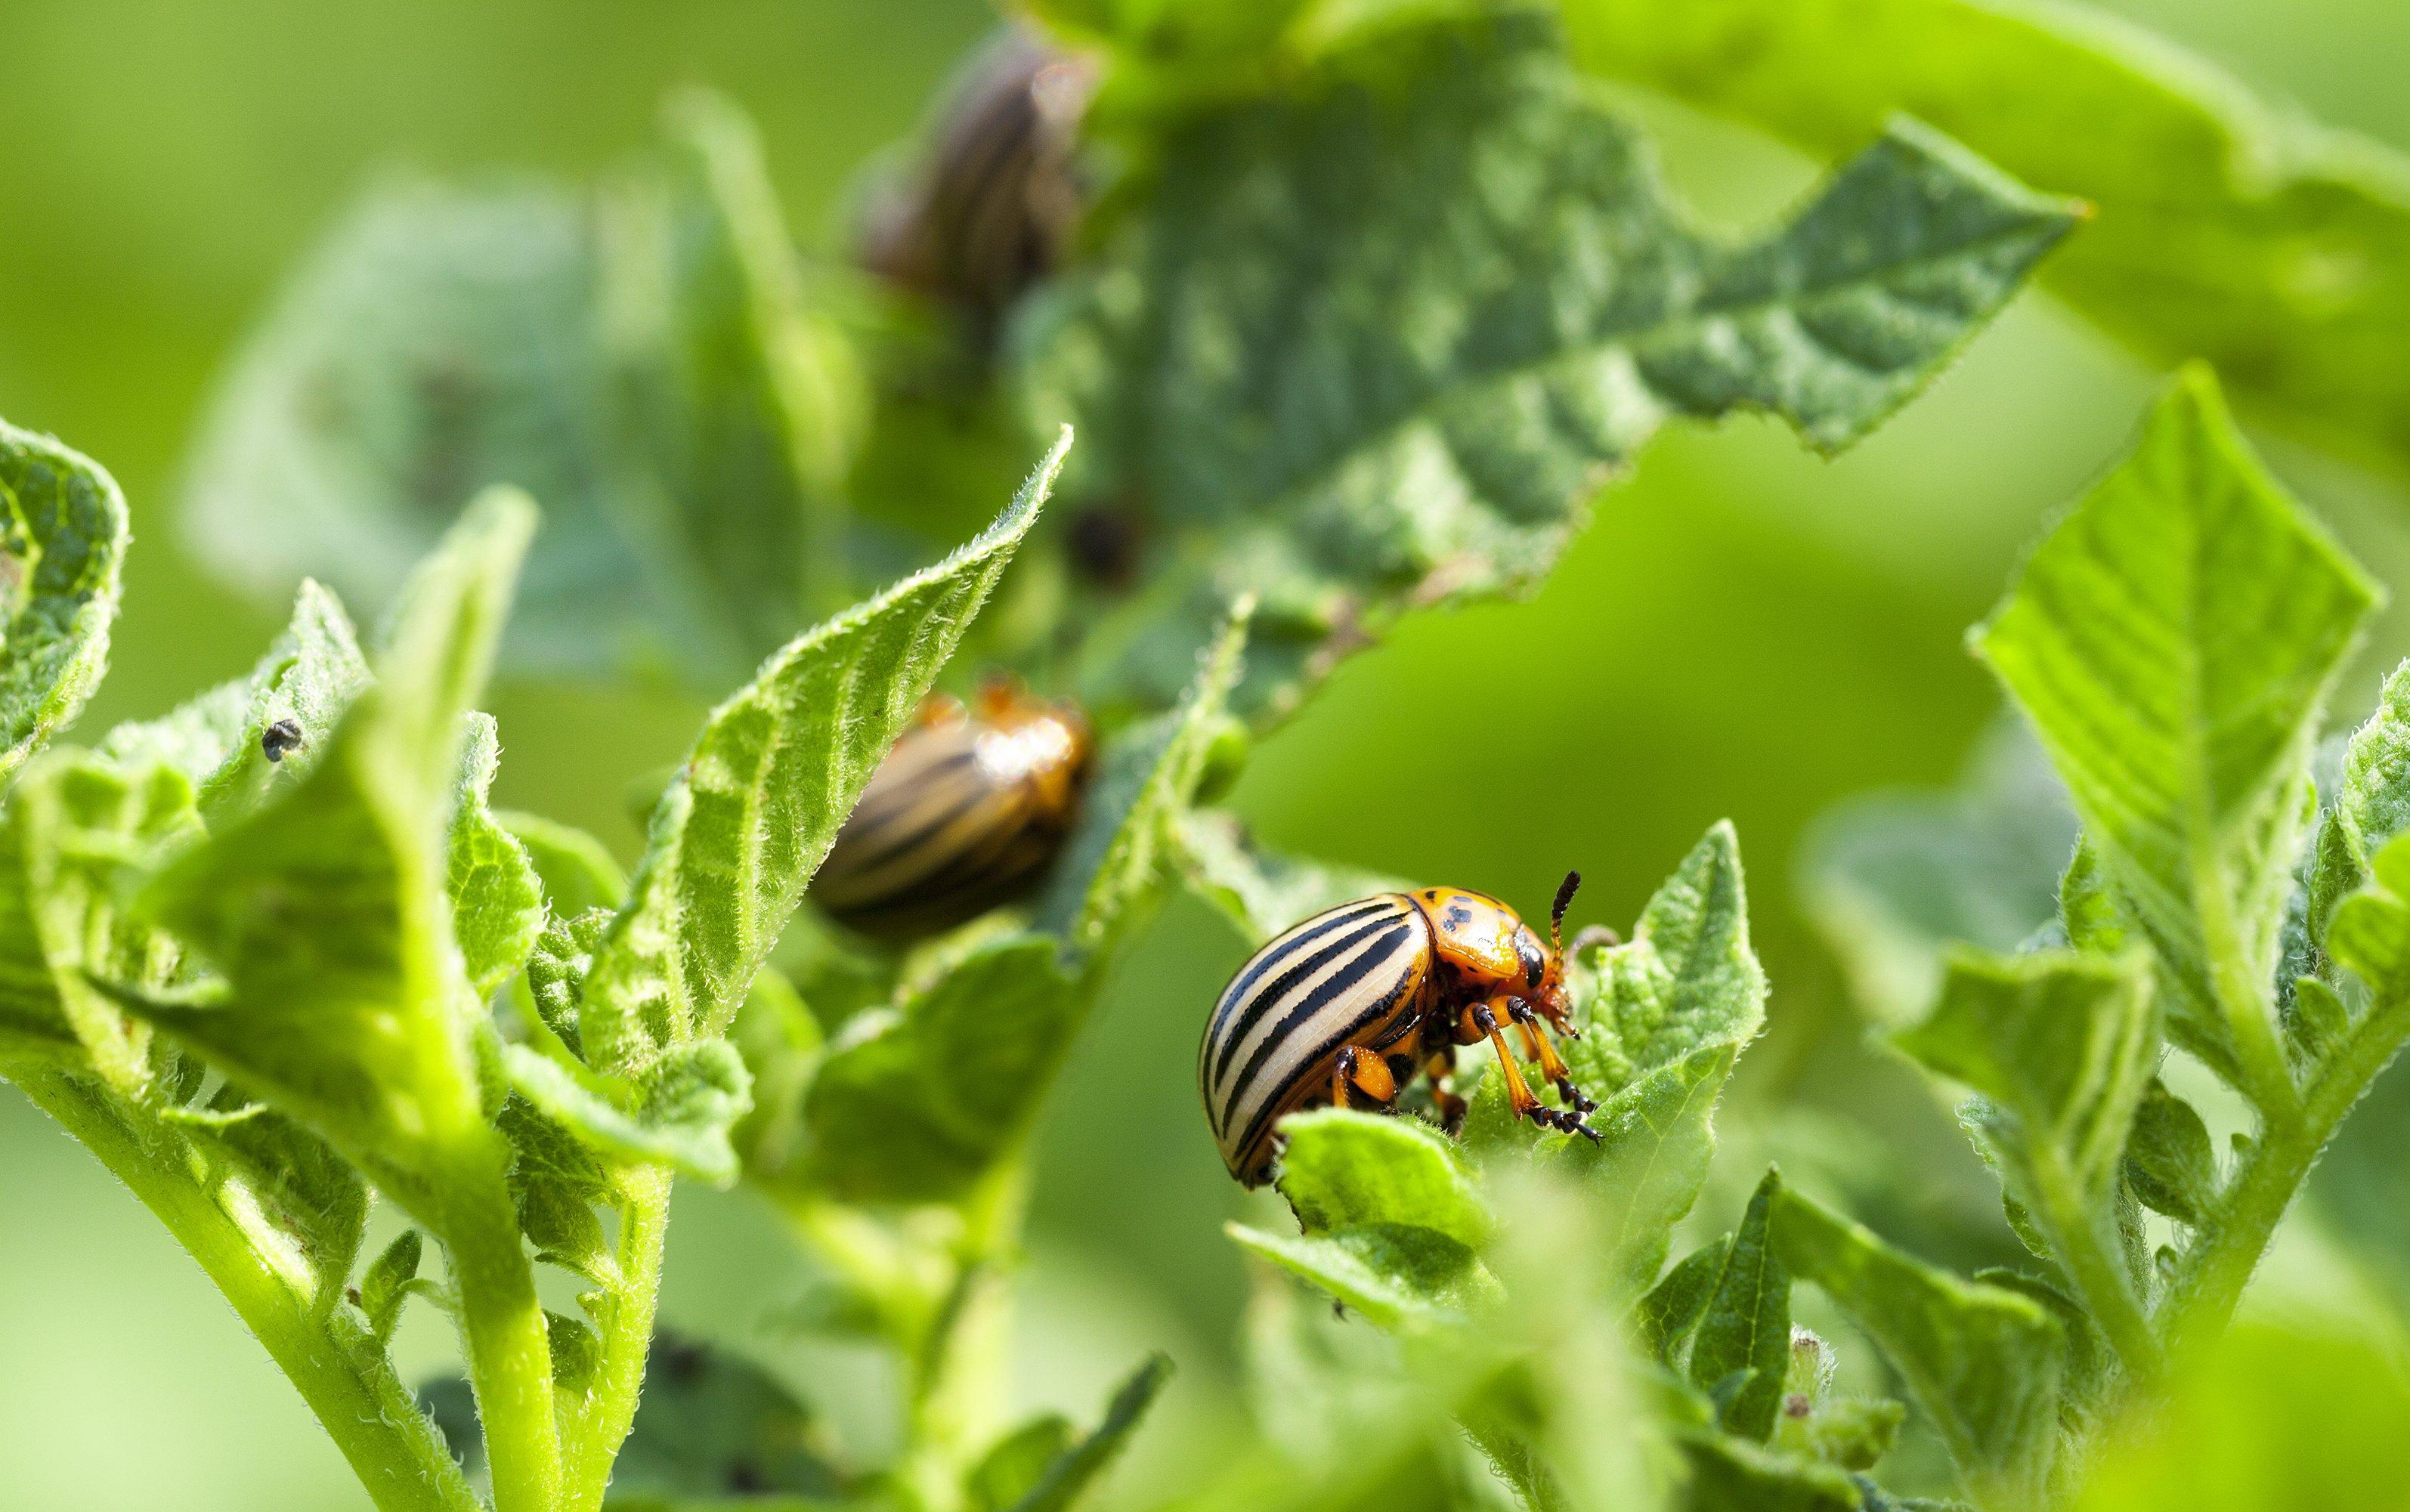 Potato beetles crawling on plants